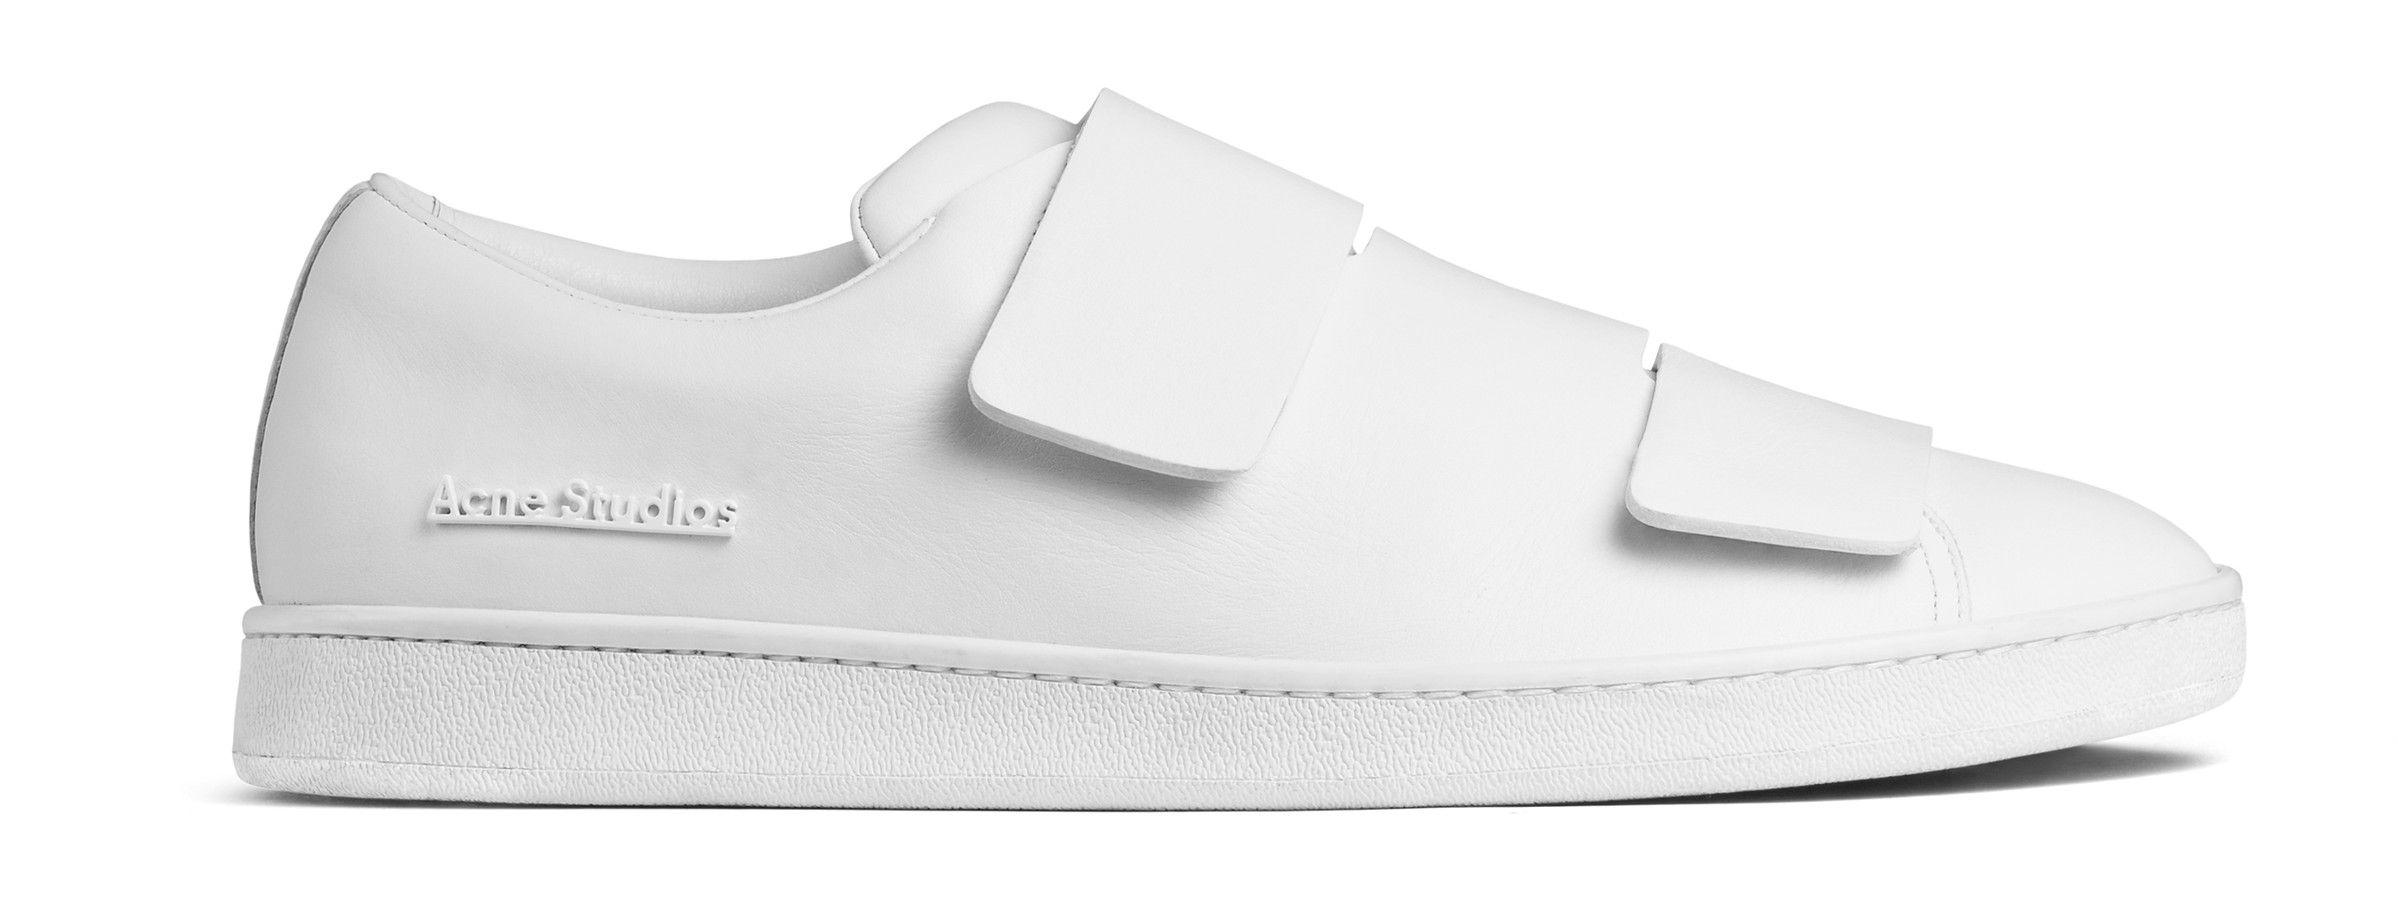 Triple lo White | Stylish shoes, Acne studios shoes, Mens denim